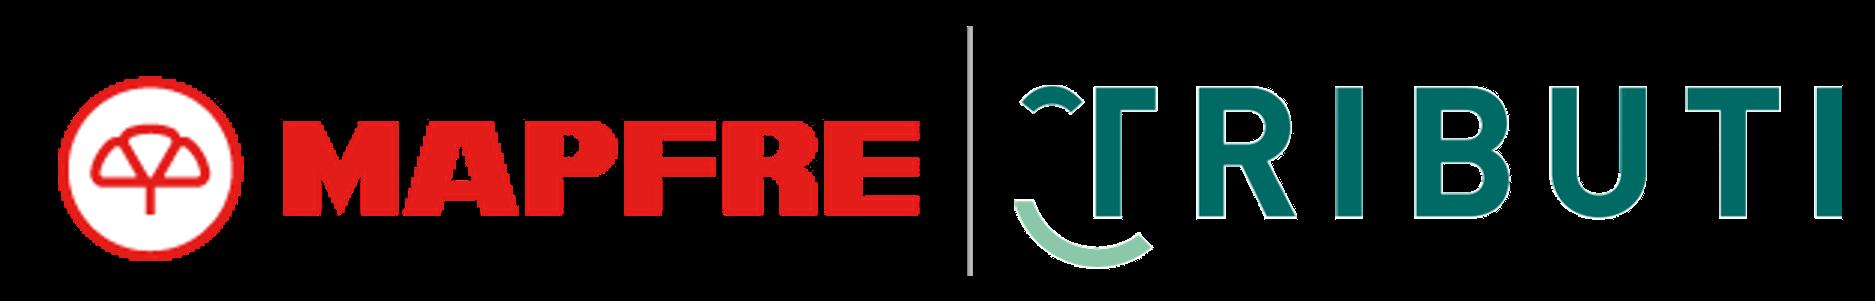 logo tributi - colsubsidio